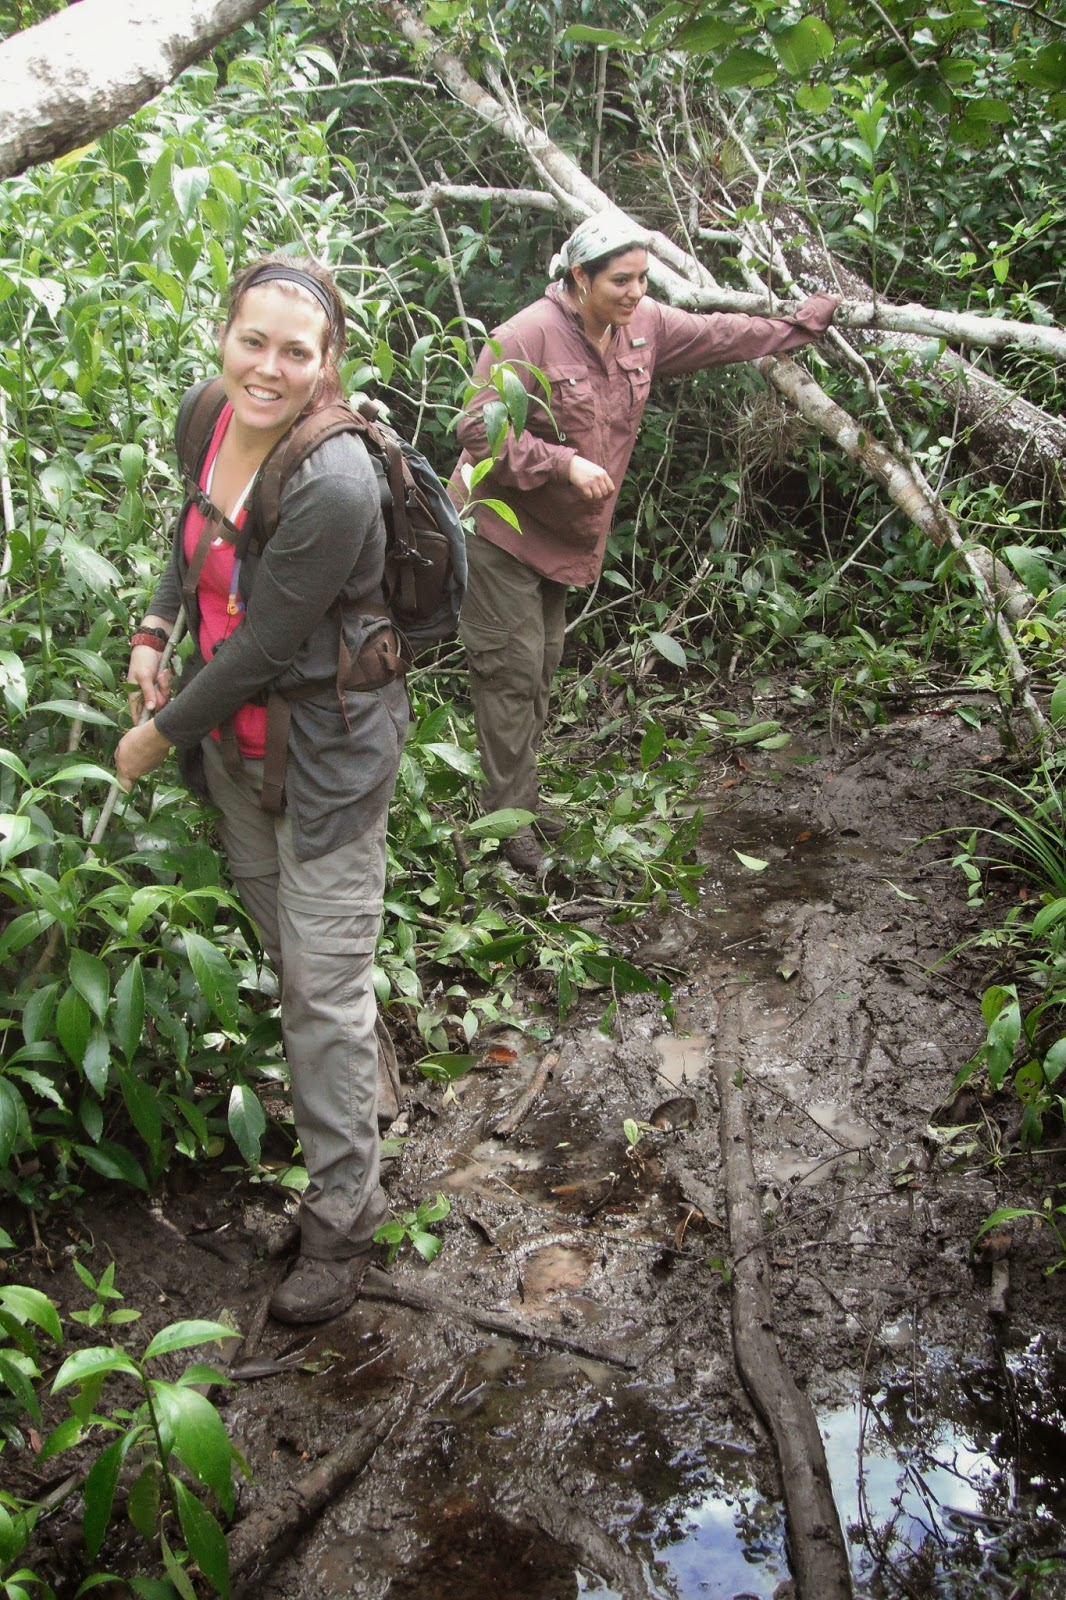 Trekking in El Mirador, Guatemala